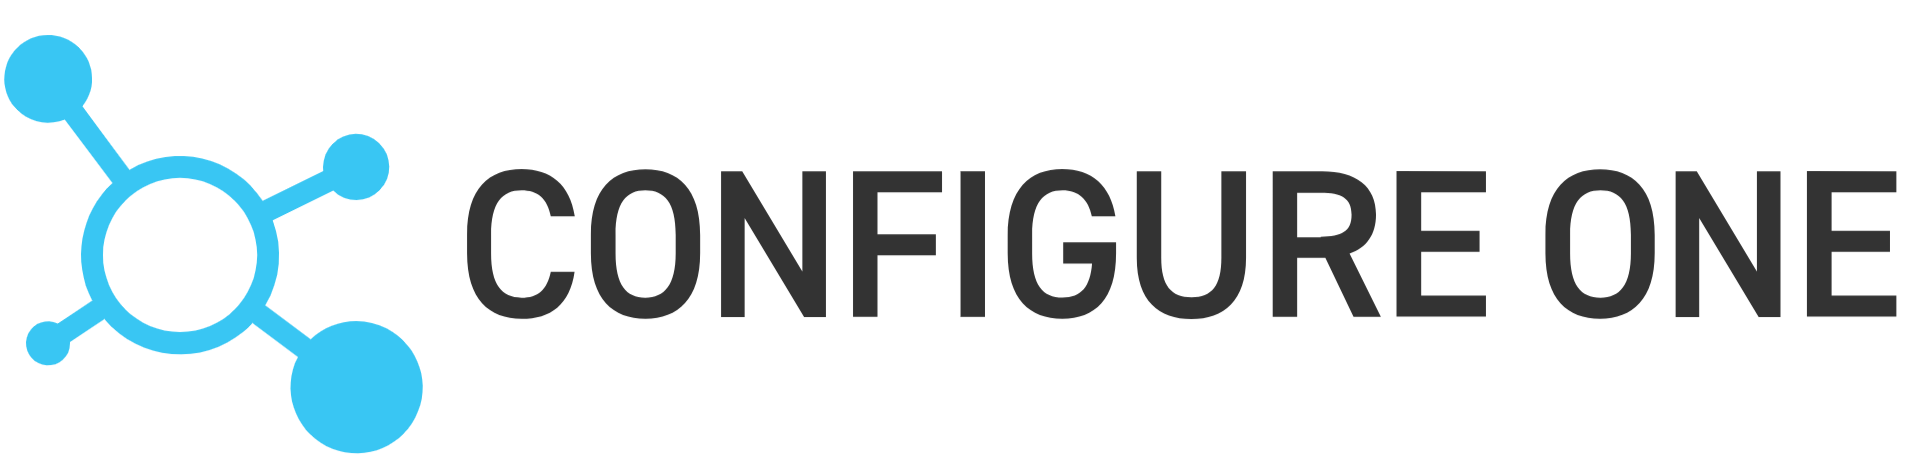 Configure One Announces New Release for their Enterprise CPQ Software